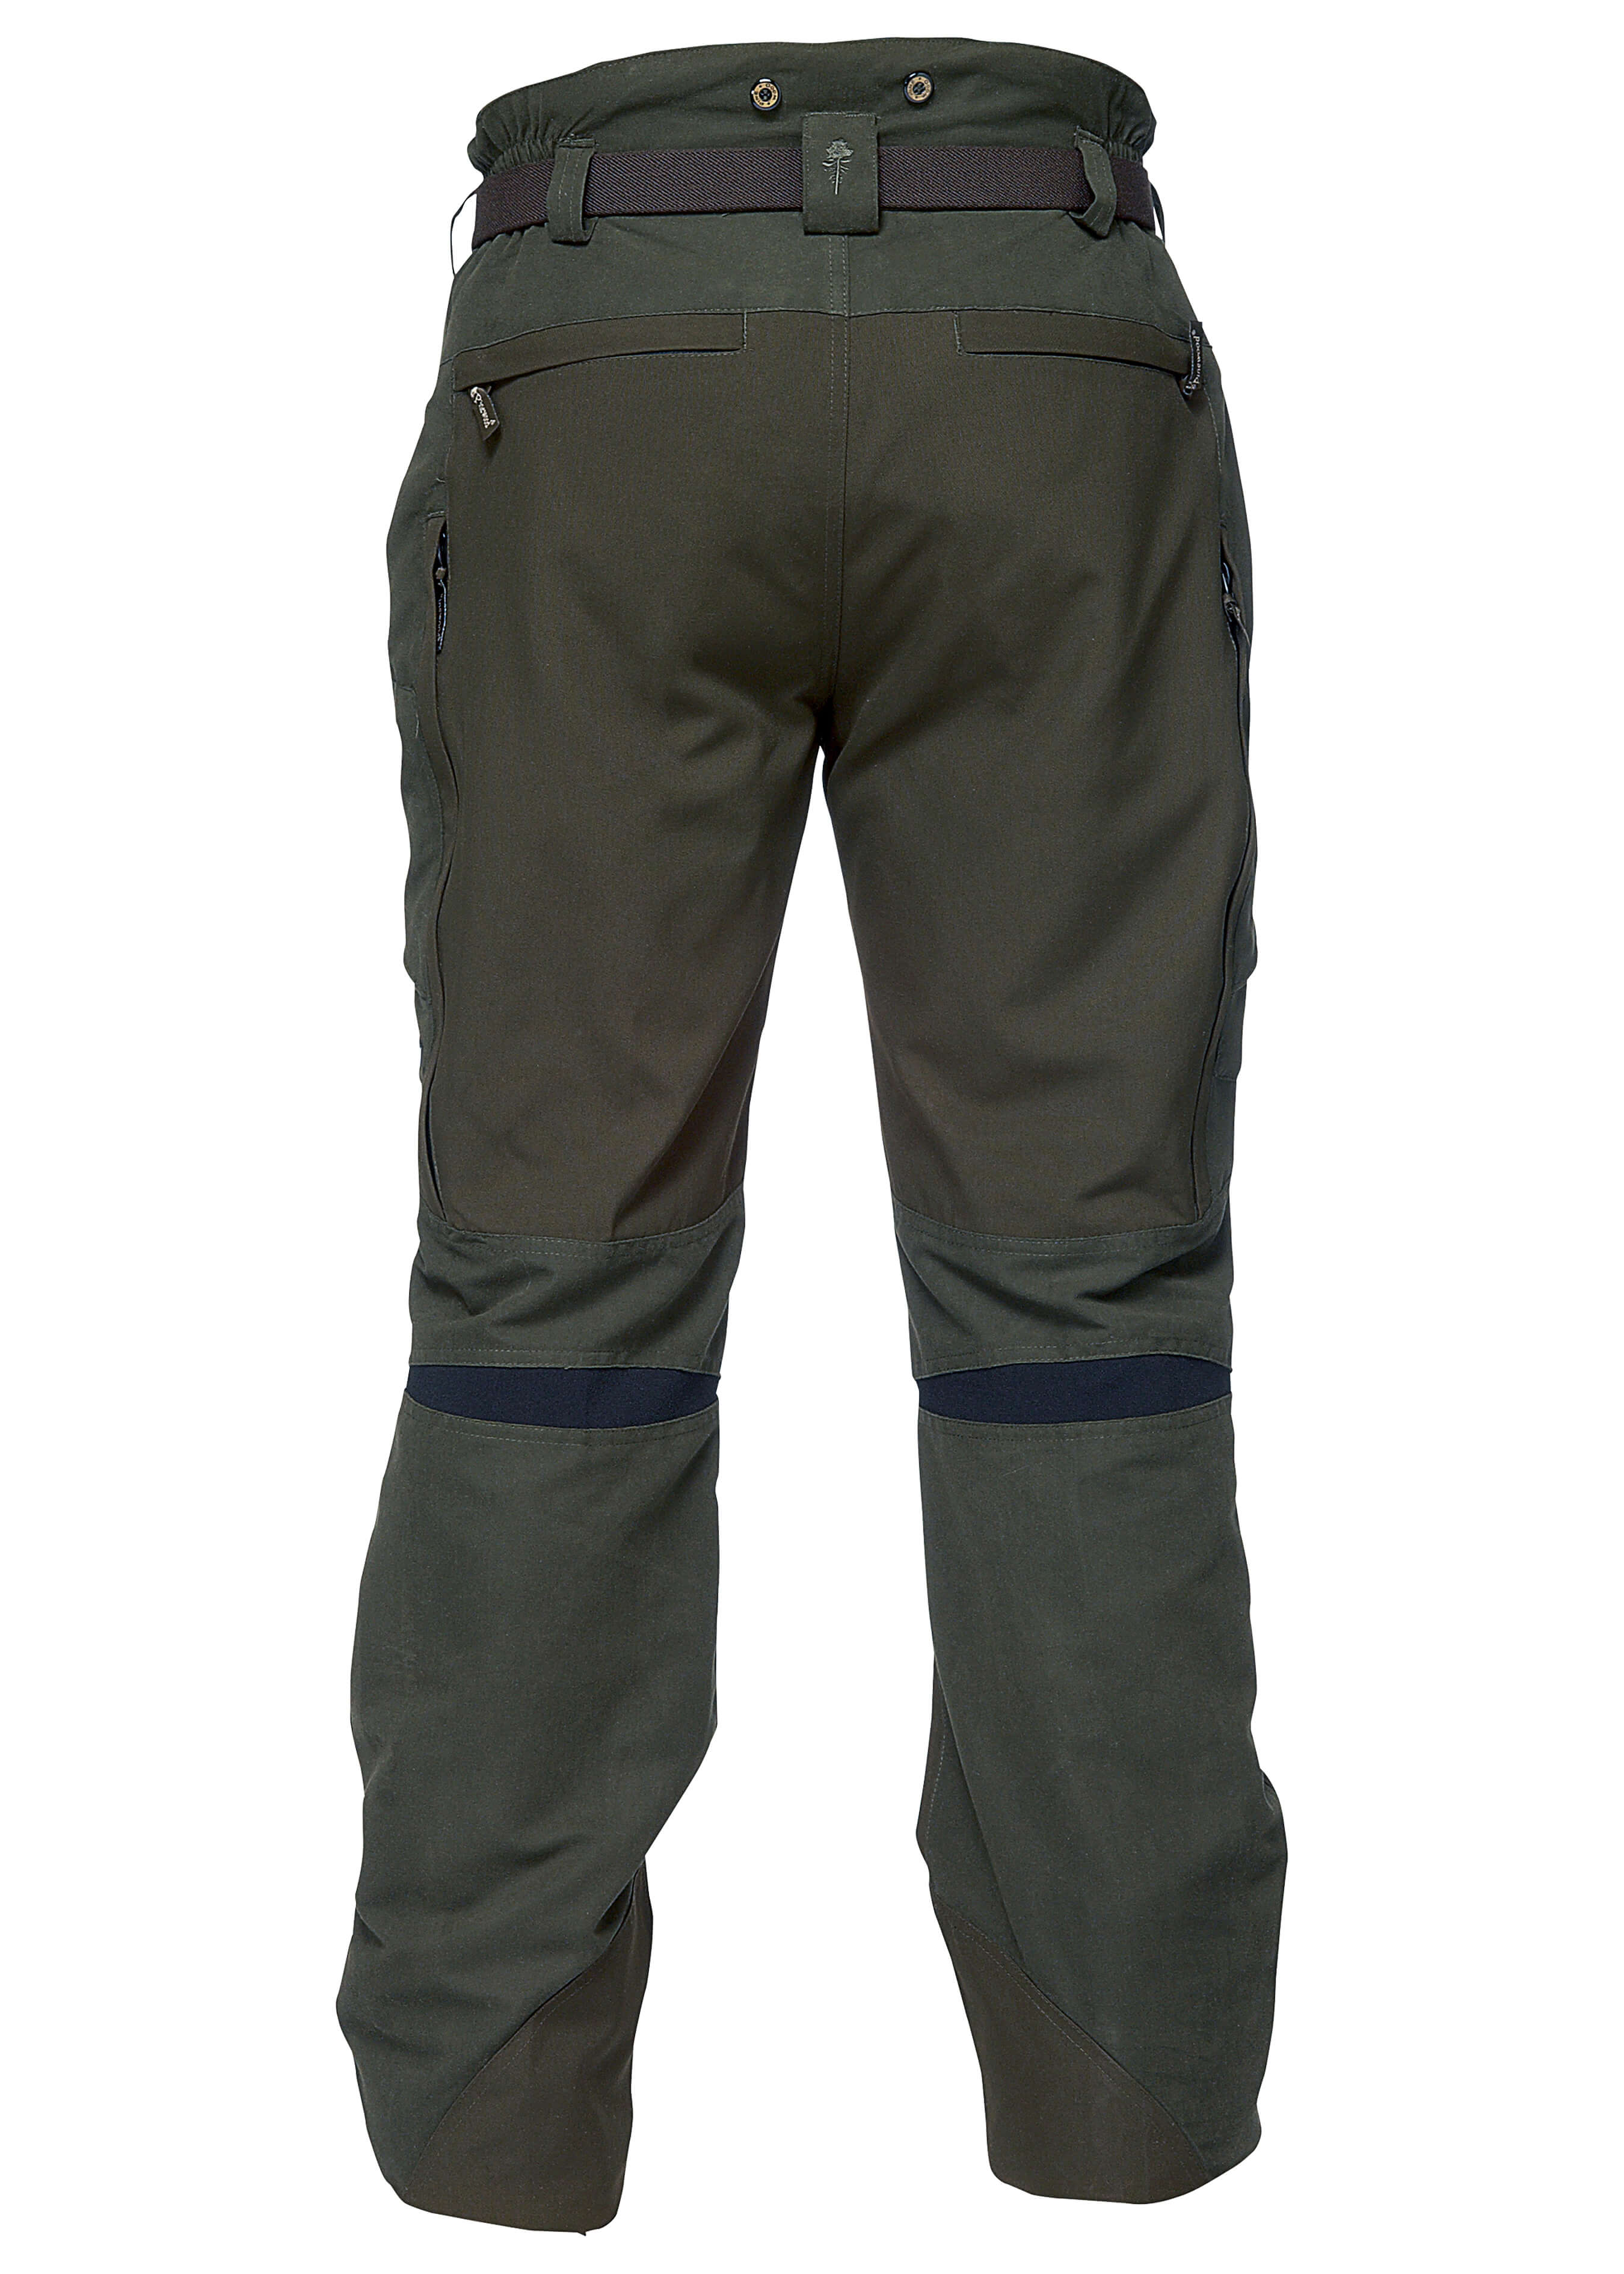 Pinewood Arbeits- und Jagdhose Hunter Pro Extreme (7988) L1418042 2